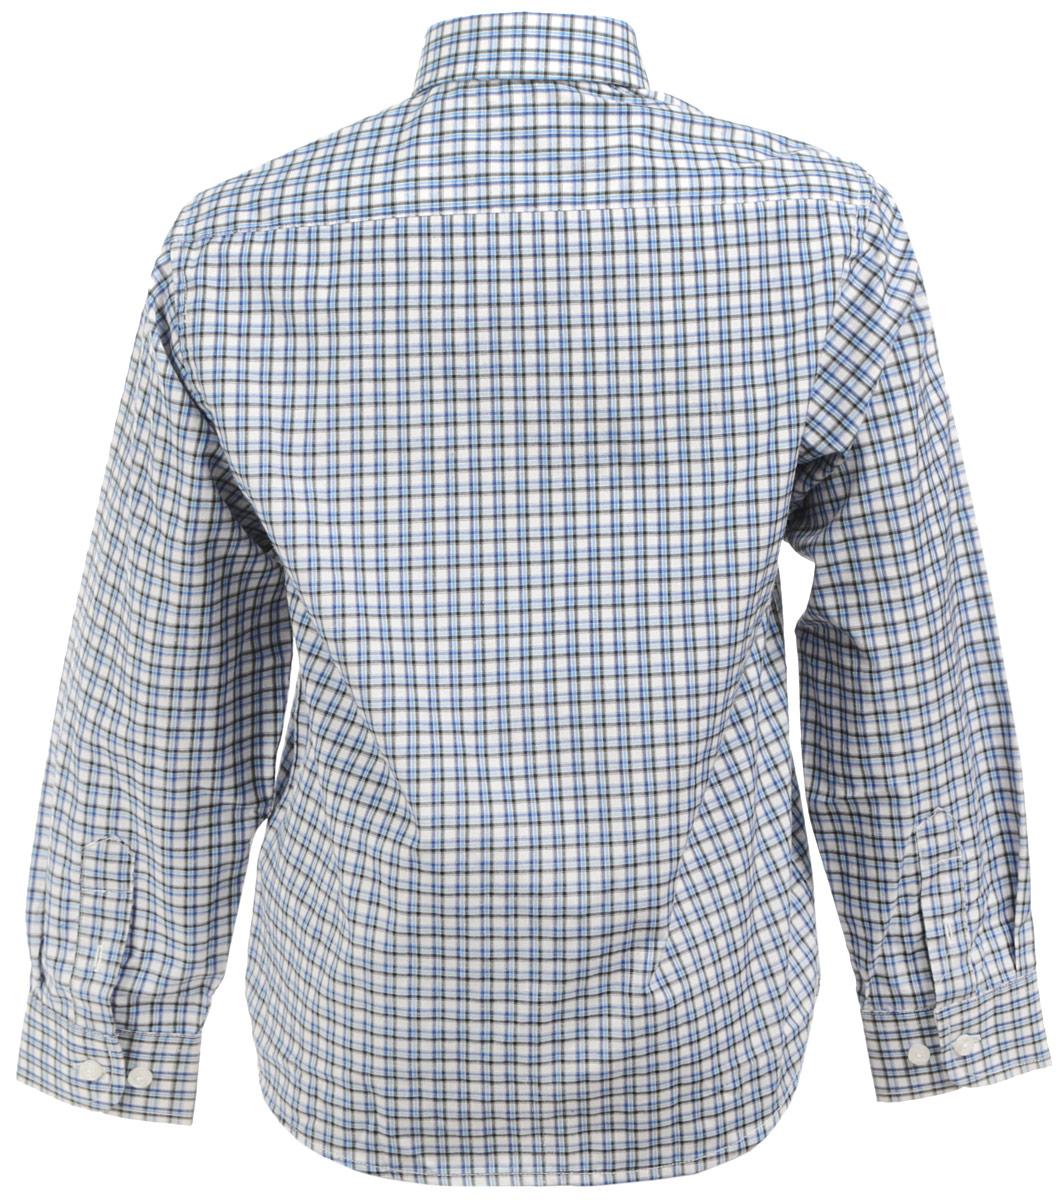 Imperator Рубашка для мальчика. Tr. 151/Gr/12/25